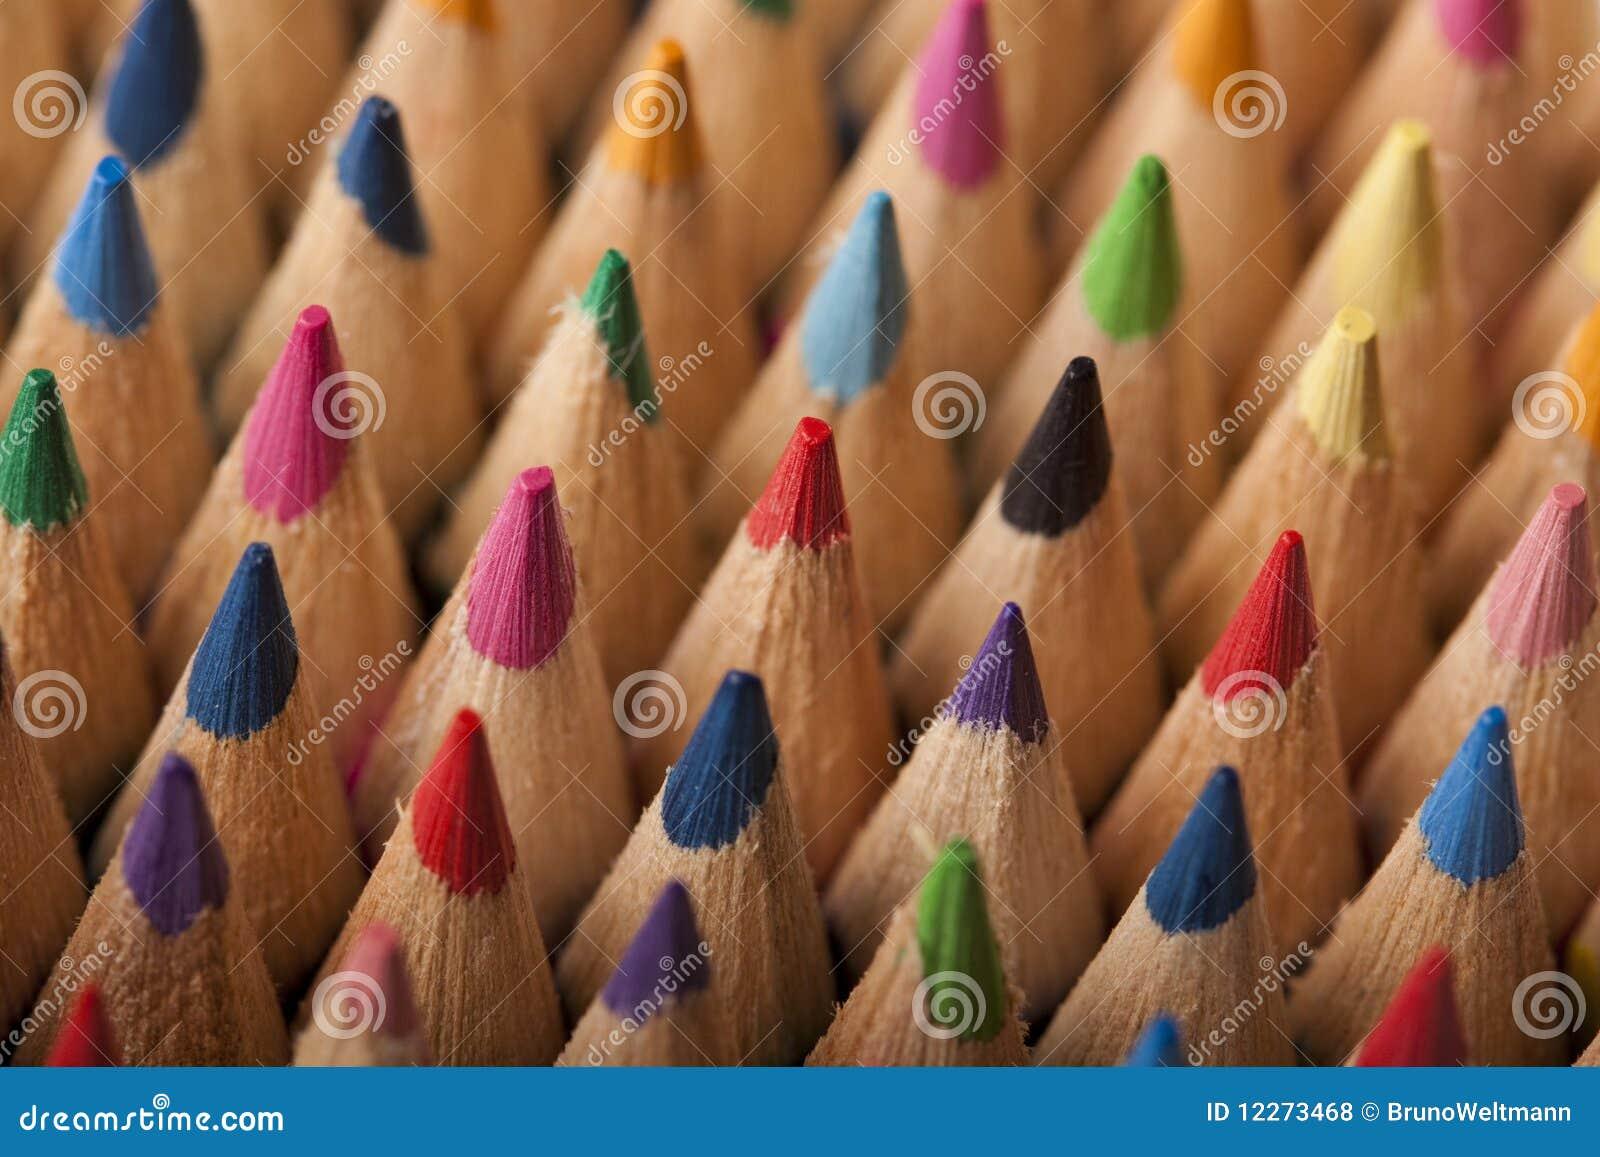 Onda colorida dos lápis